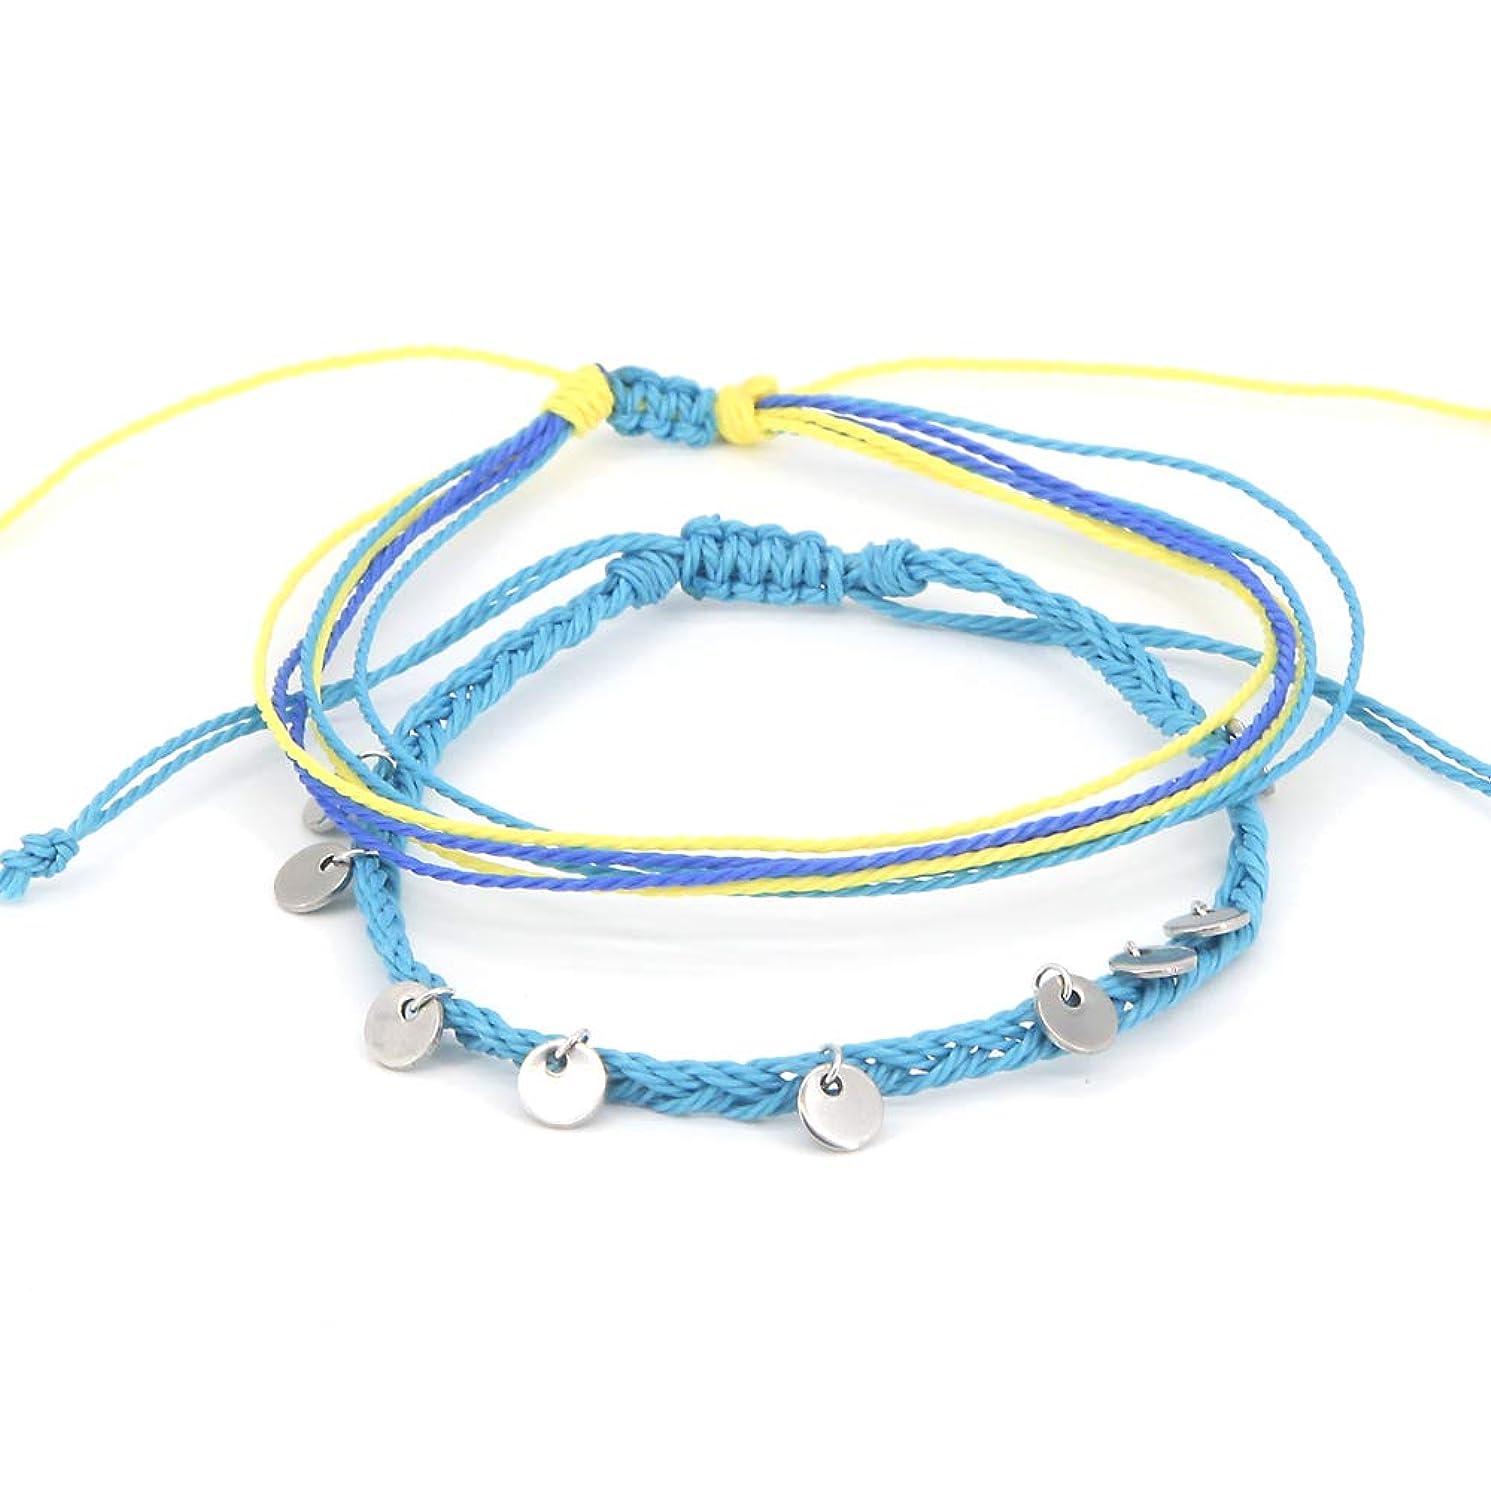 Waterproof Boho Anklet Handmade Braided Rope Ankle Bracelet Bead Surfer Beach Foot Jewelry for Women